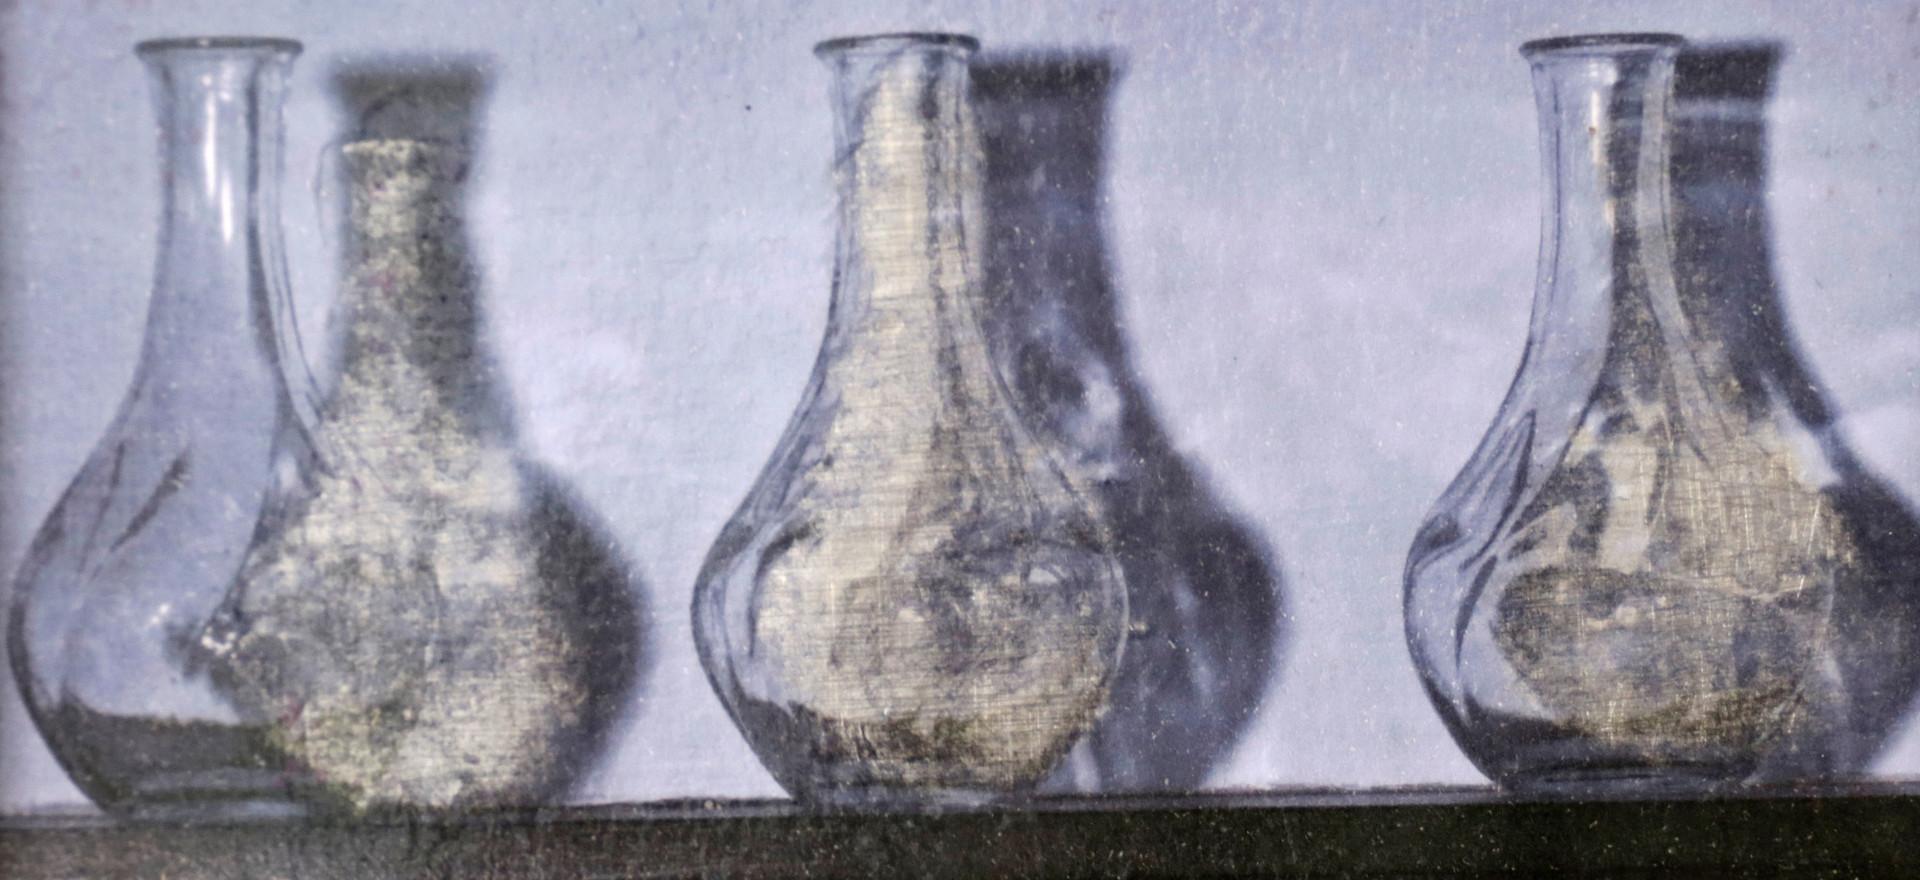 Glass Vases 2- image